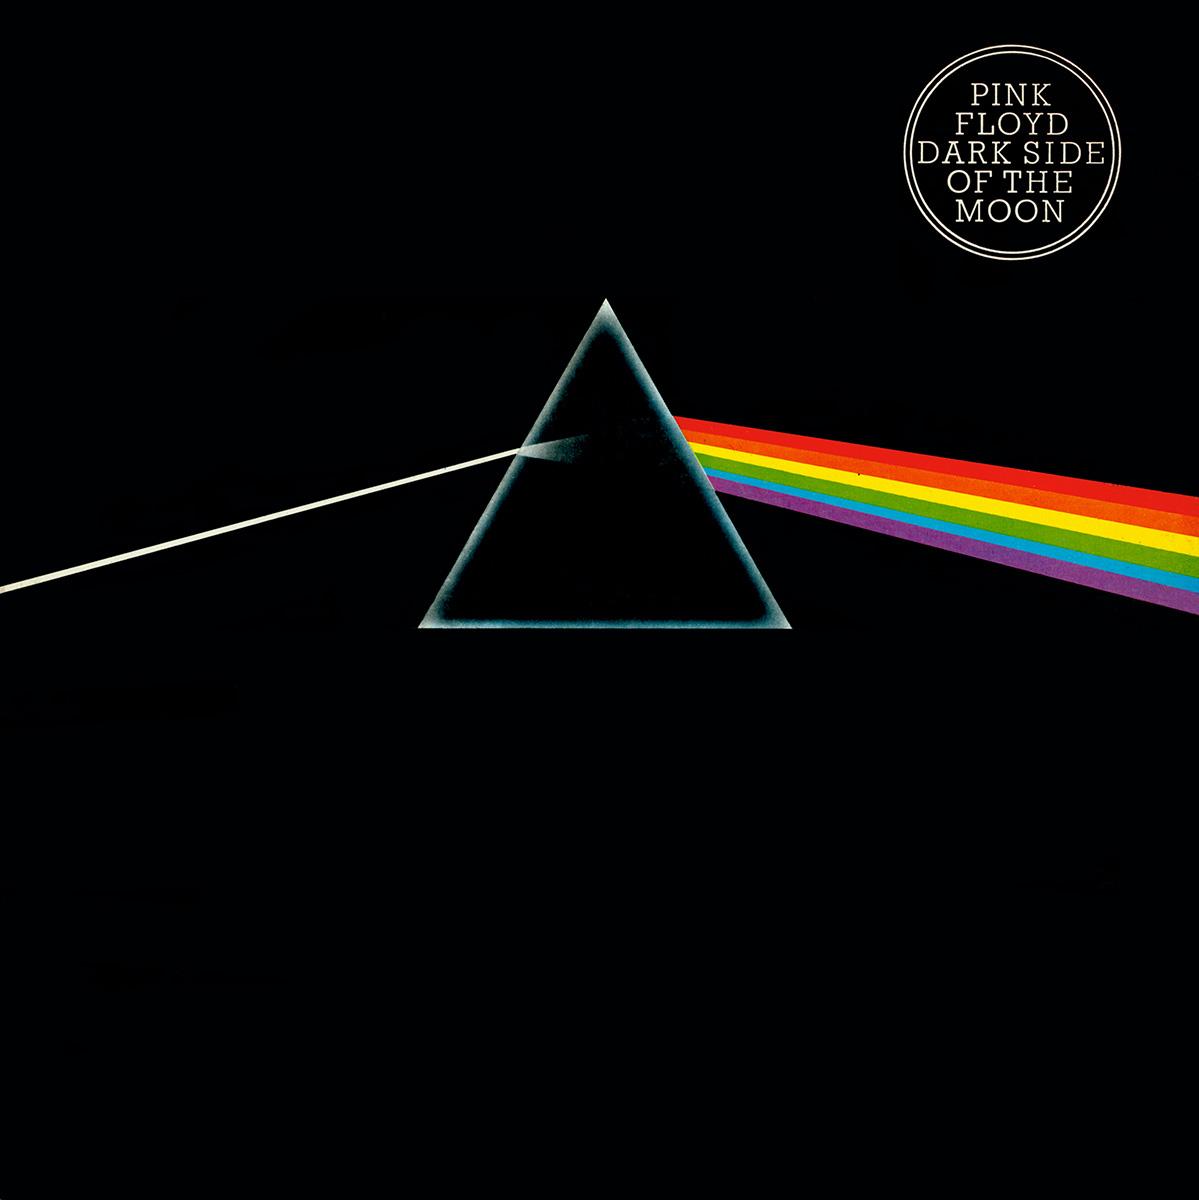 Vinyl Philosophy Vinyl Lp Cover Art From The Great